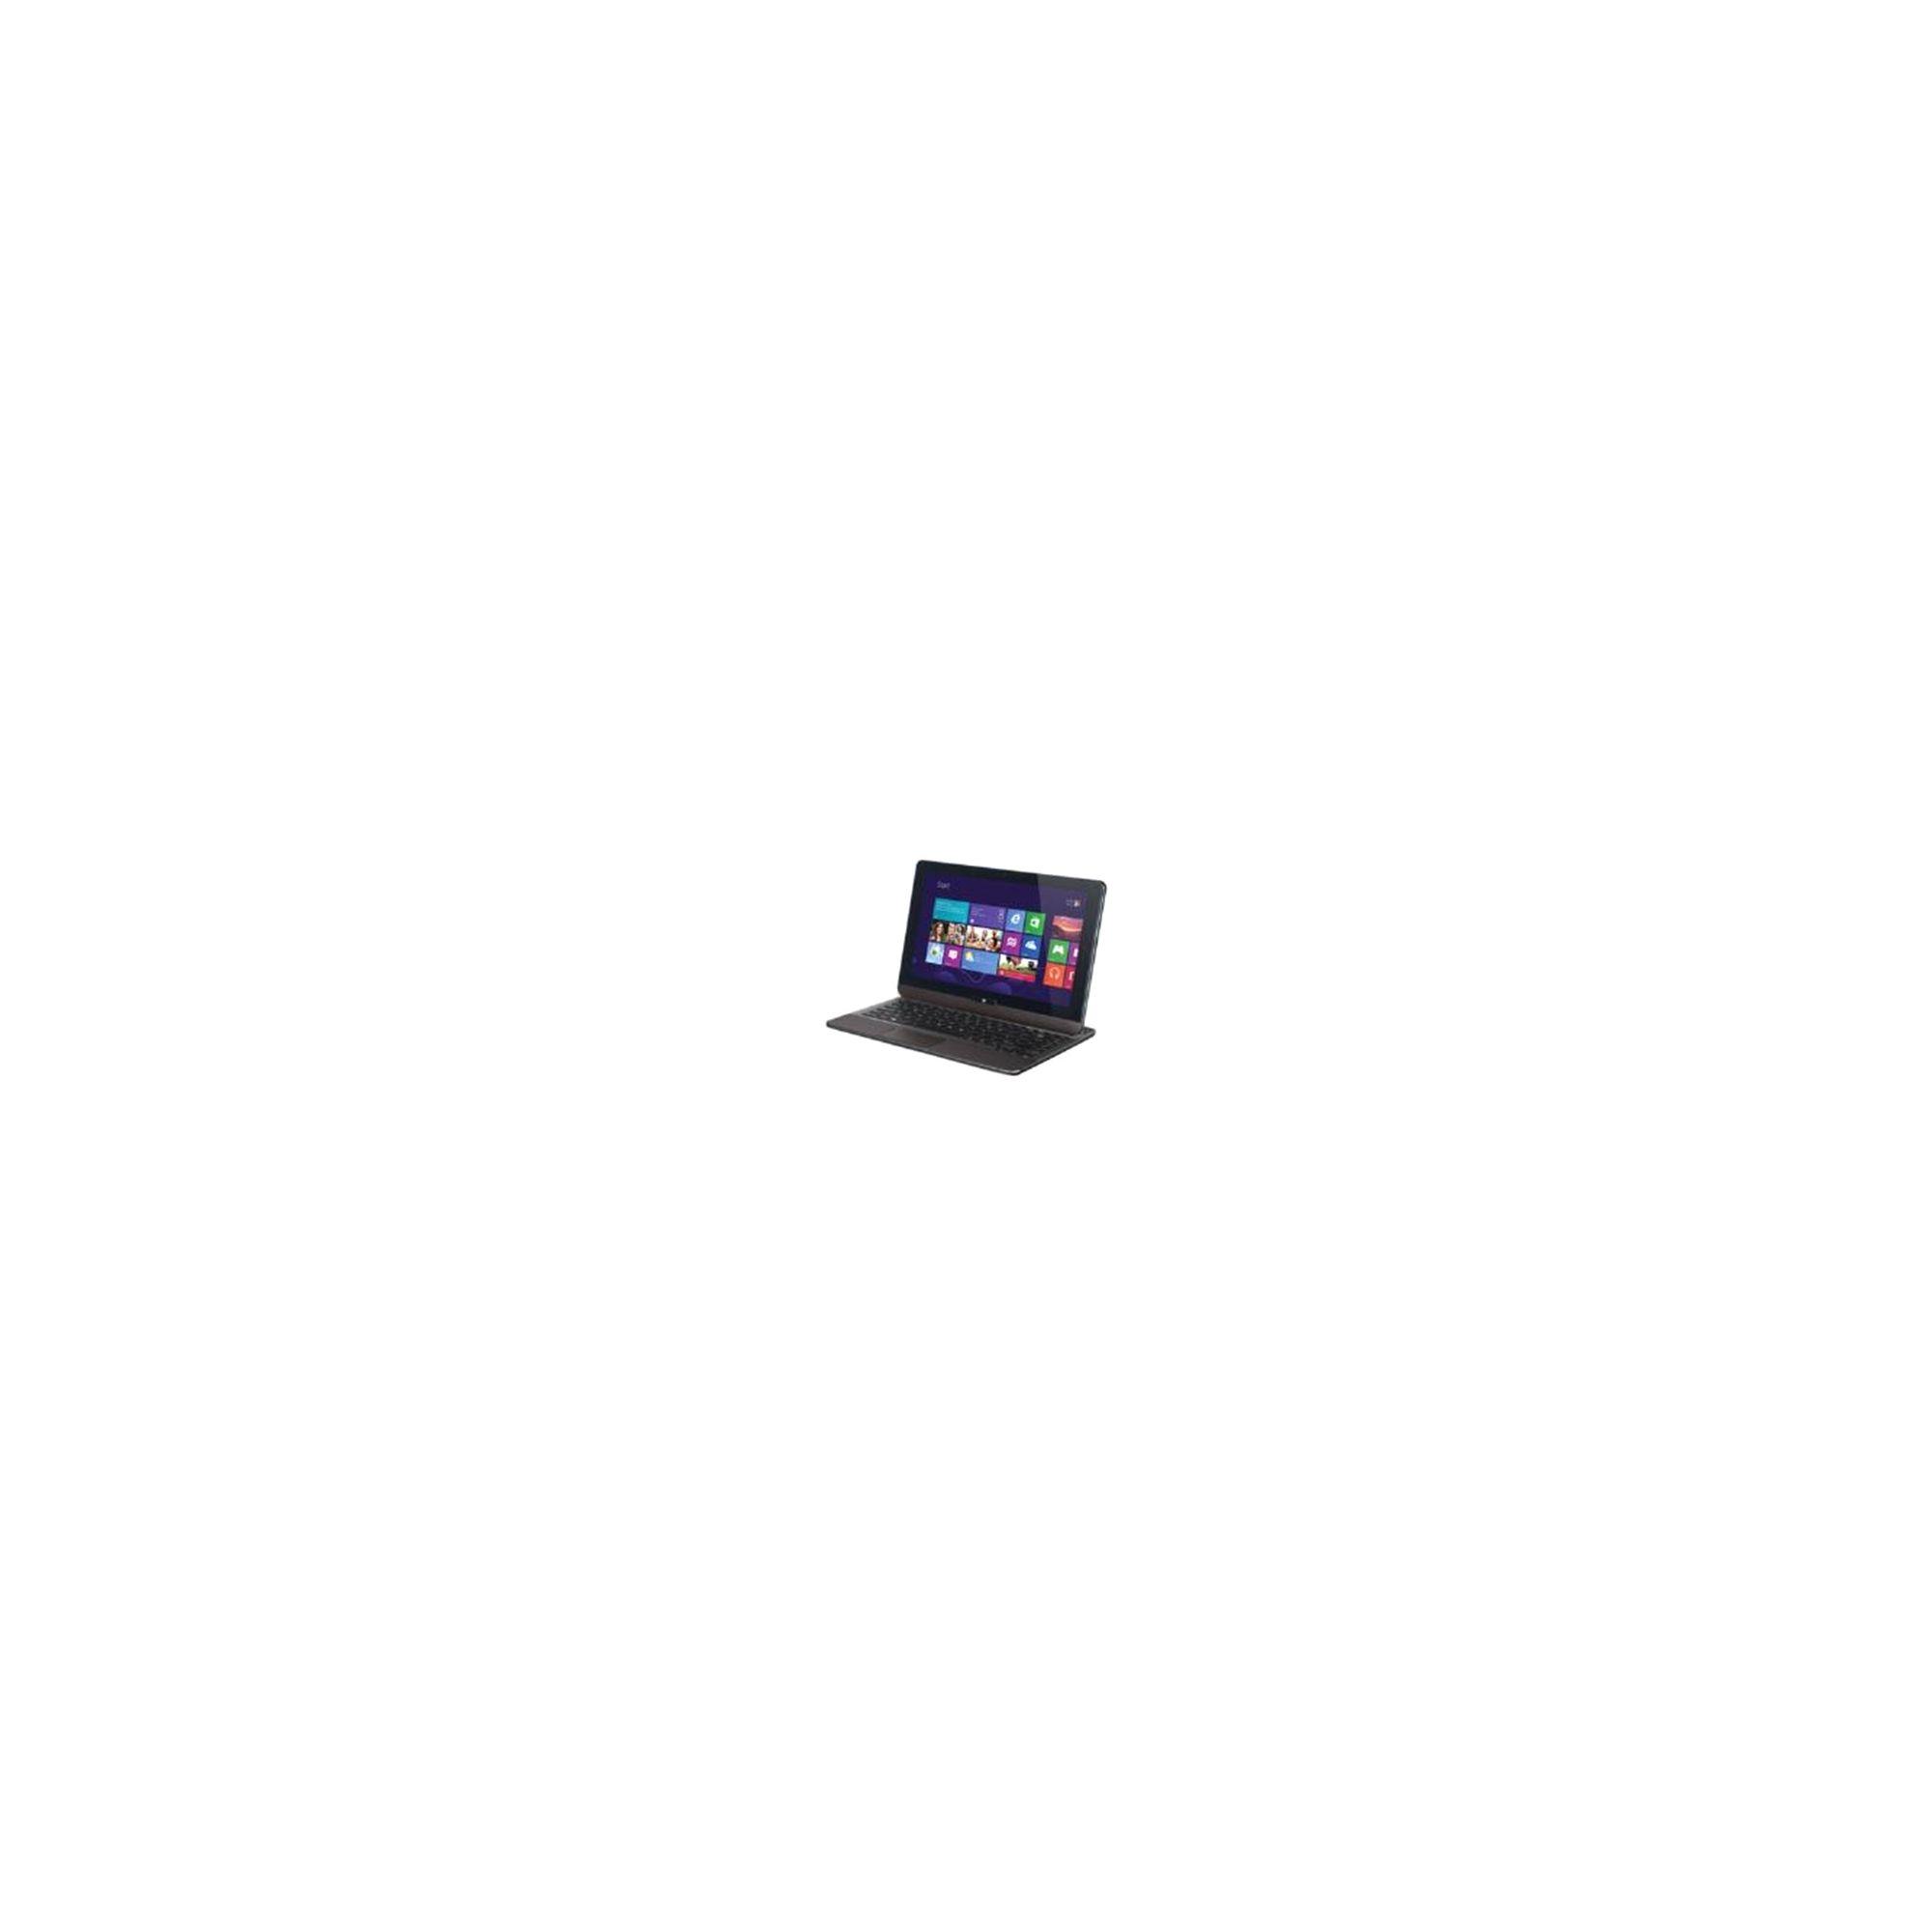 Toshiba Satellite U920T-11C (12.5 inch) Notebook Core i5 (3317U) 1.7GHz 4GB 128GB SSD WLAN BT Webcam Windows 8 Pro 64-bit (Intel HD Graphics 4000) at Tescos Direct